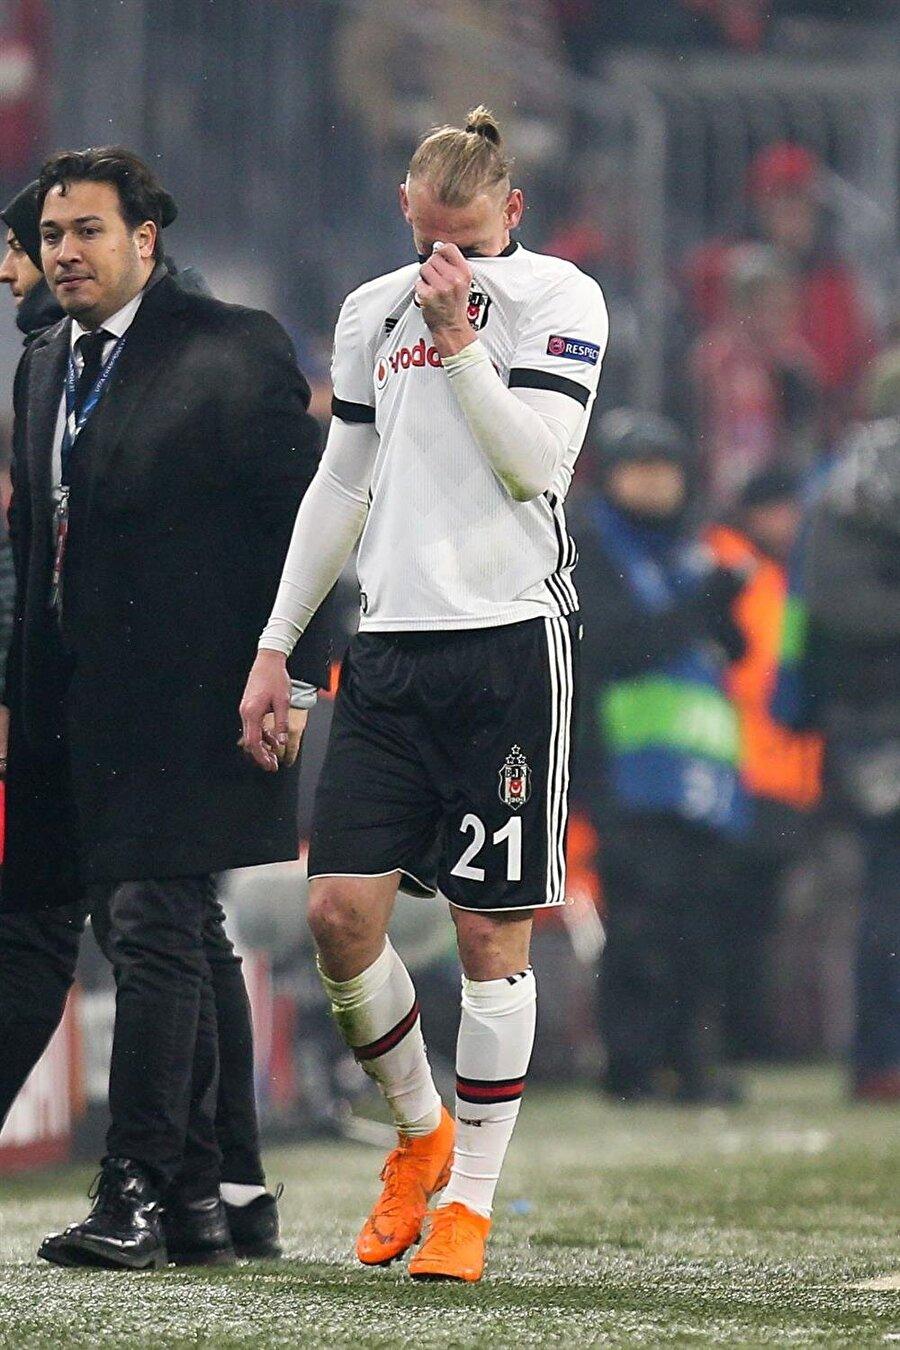 Vida, Beşiktaşlı taraftarları hayal kırıklığına uğrattı. (Fotoğraf: AA)